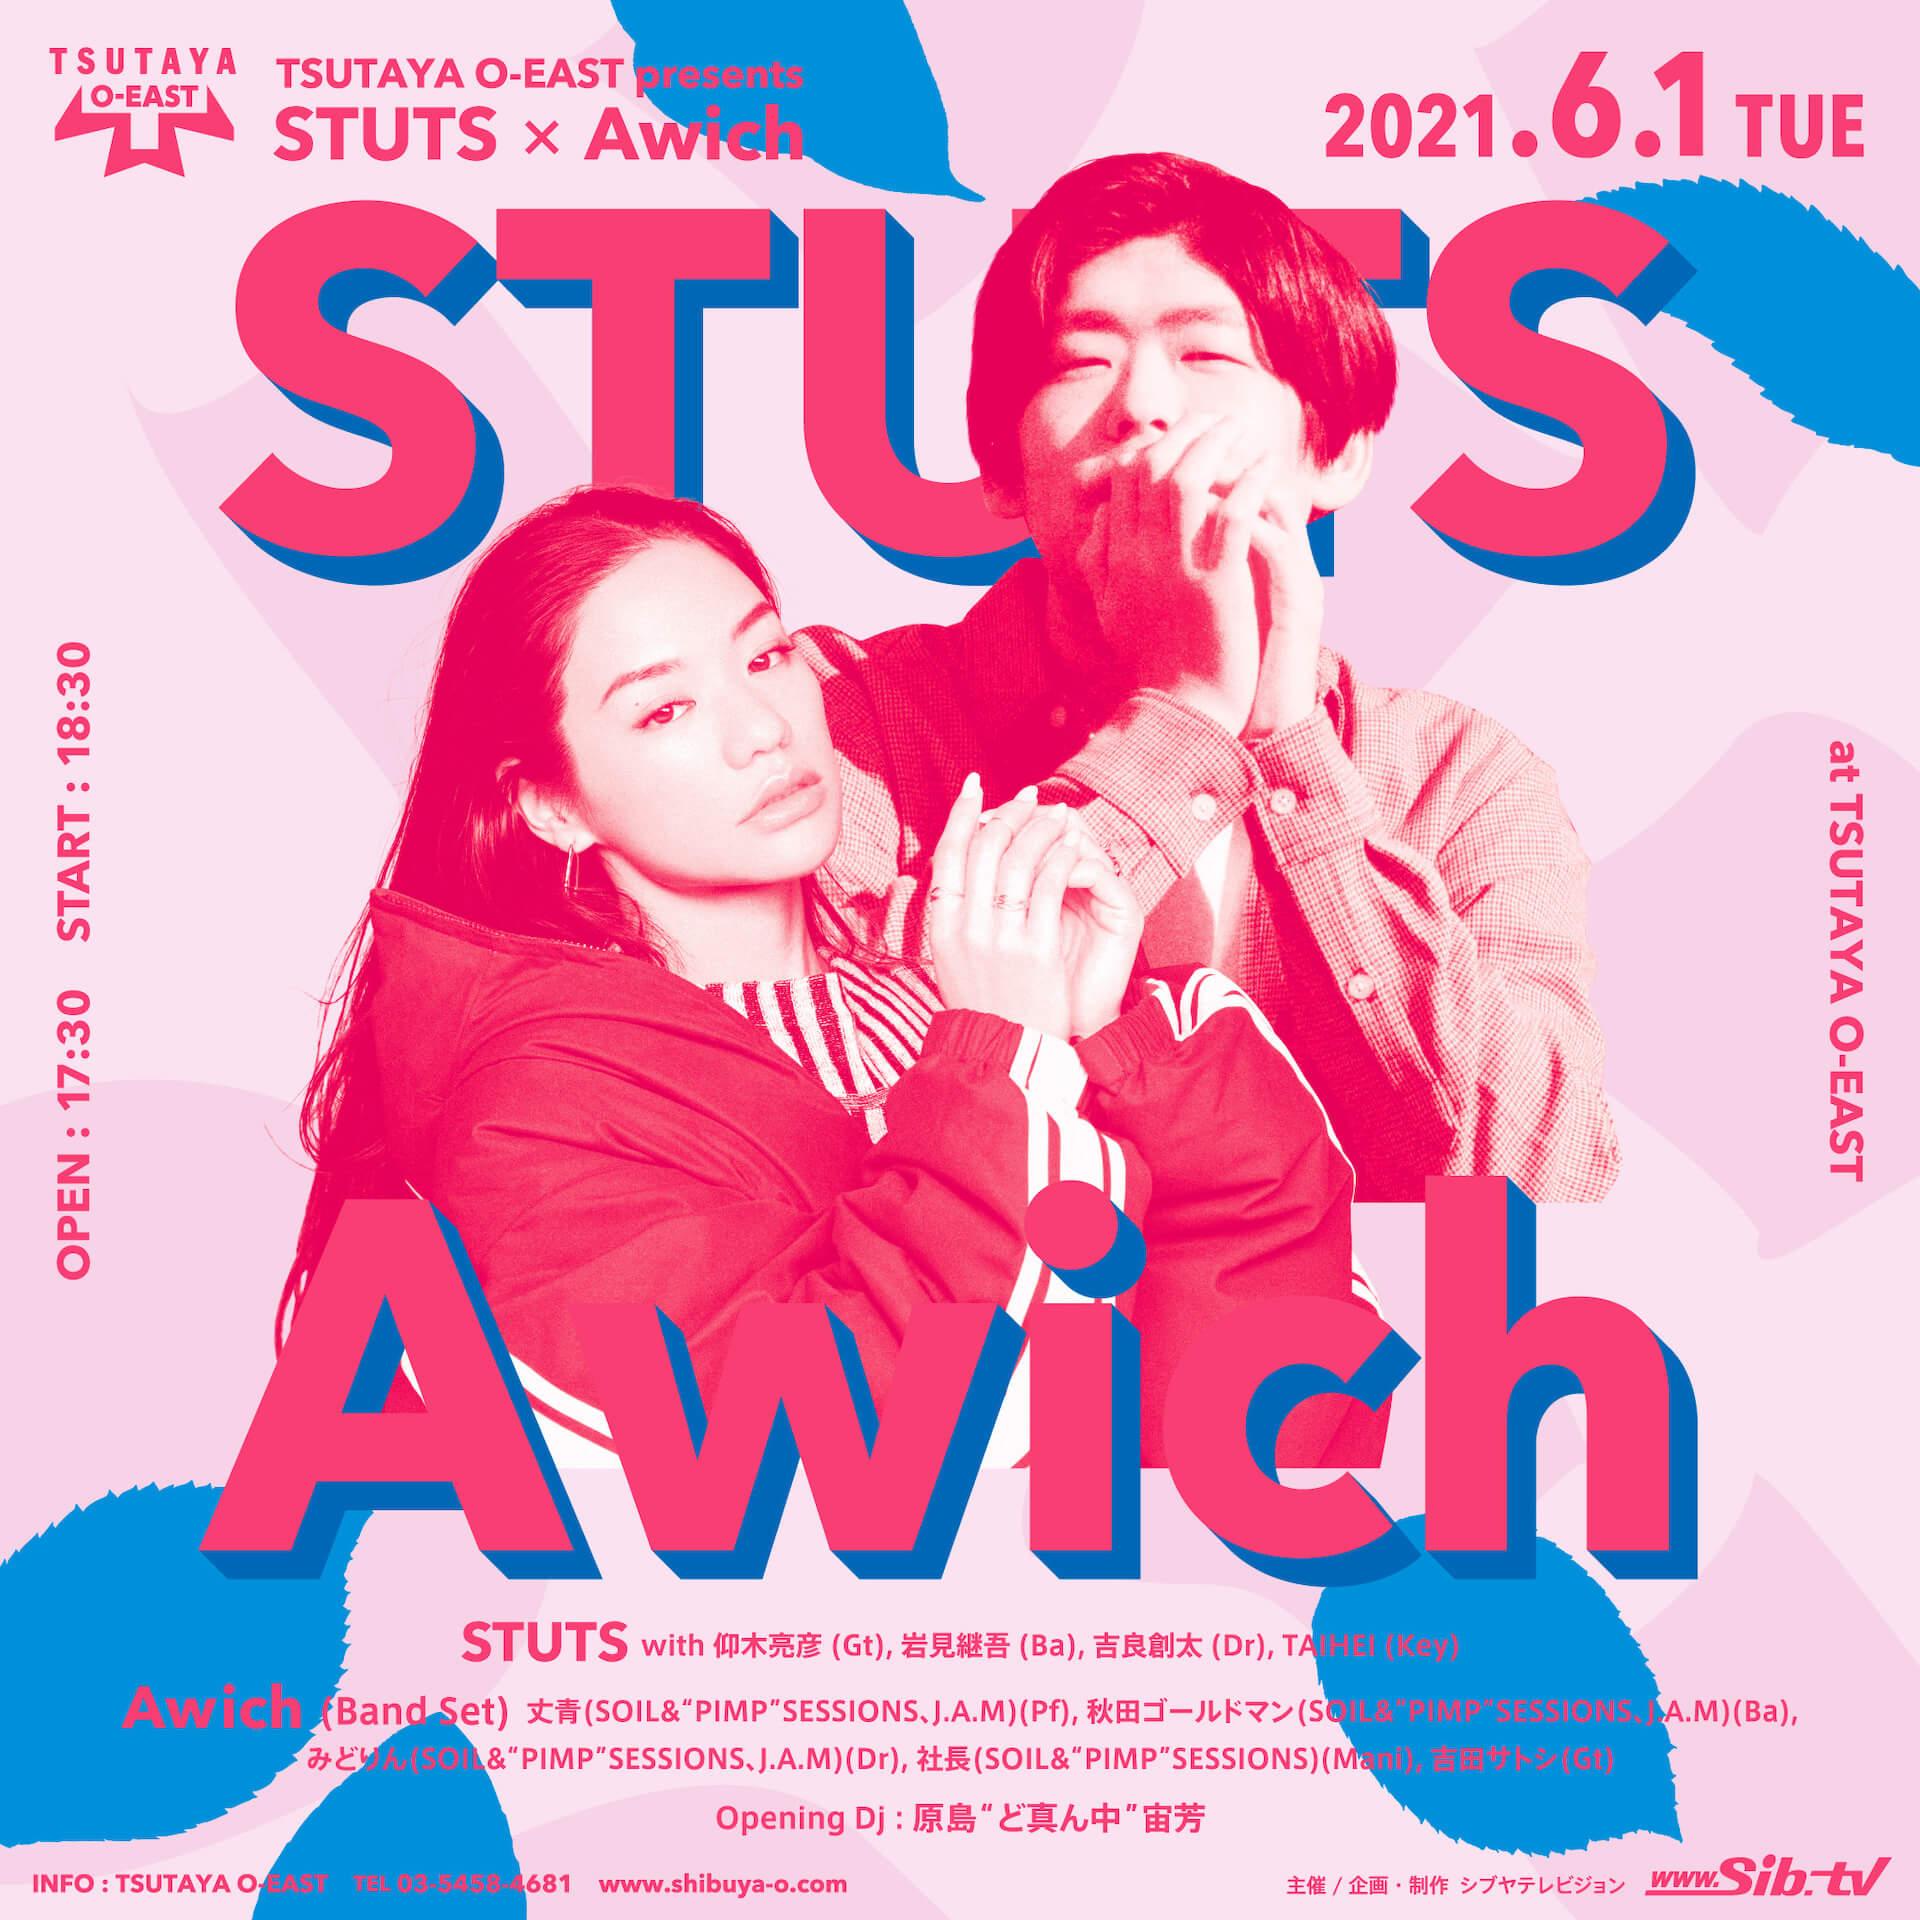 STUTS × Awichの2マンライブにBIM、鎮座DOPENESS、DOGMA、JJJ、kZmが客演参加! music210528_stuts_awich_1